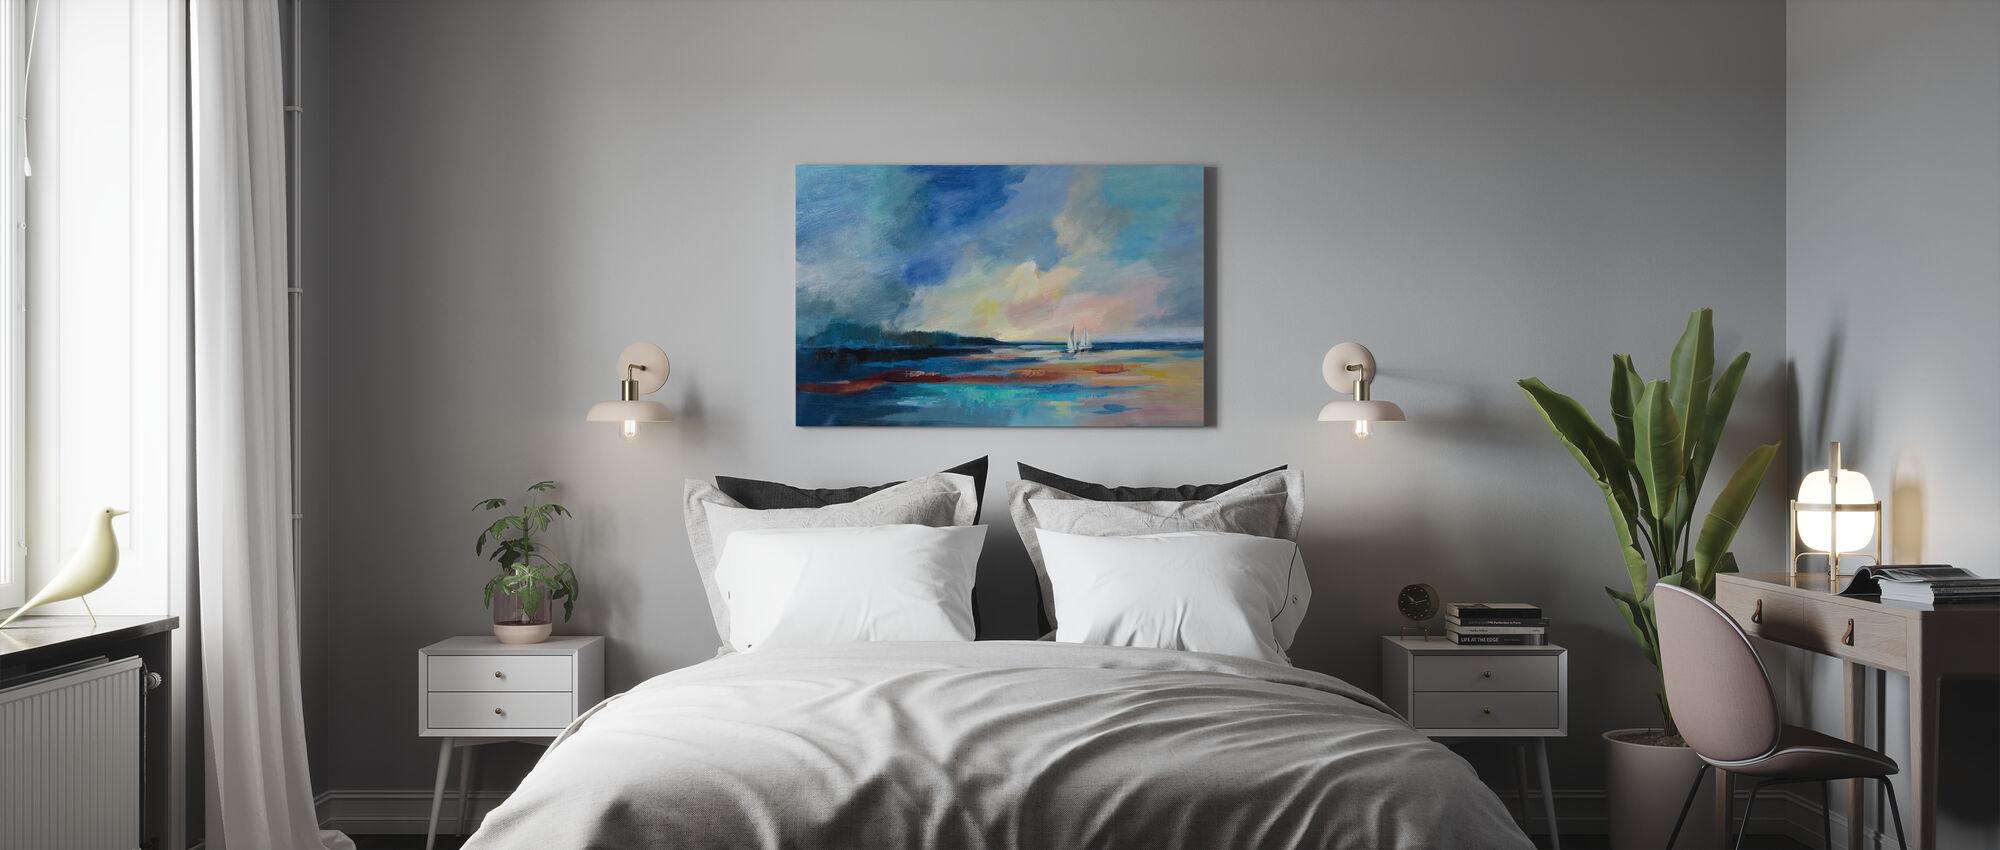 Ultramarine Sea and Sky - Canvas print - Bedroom